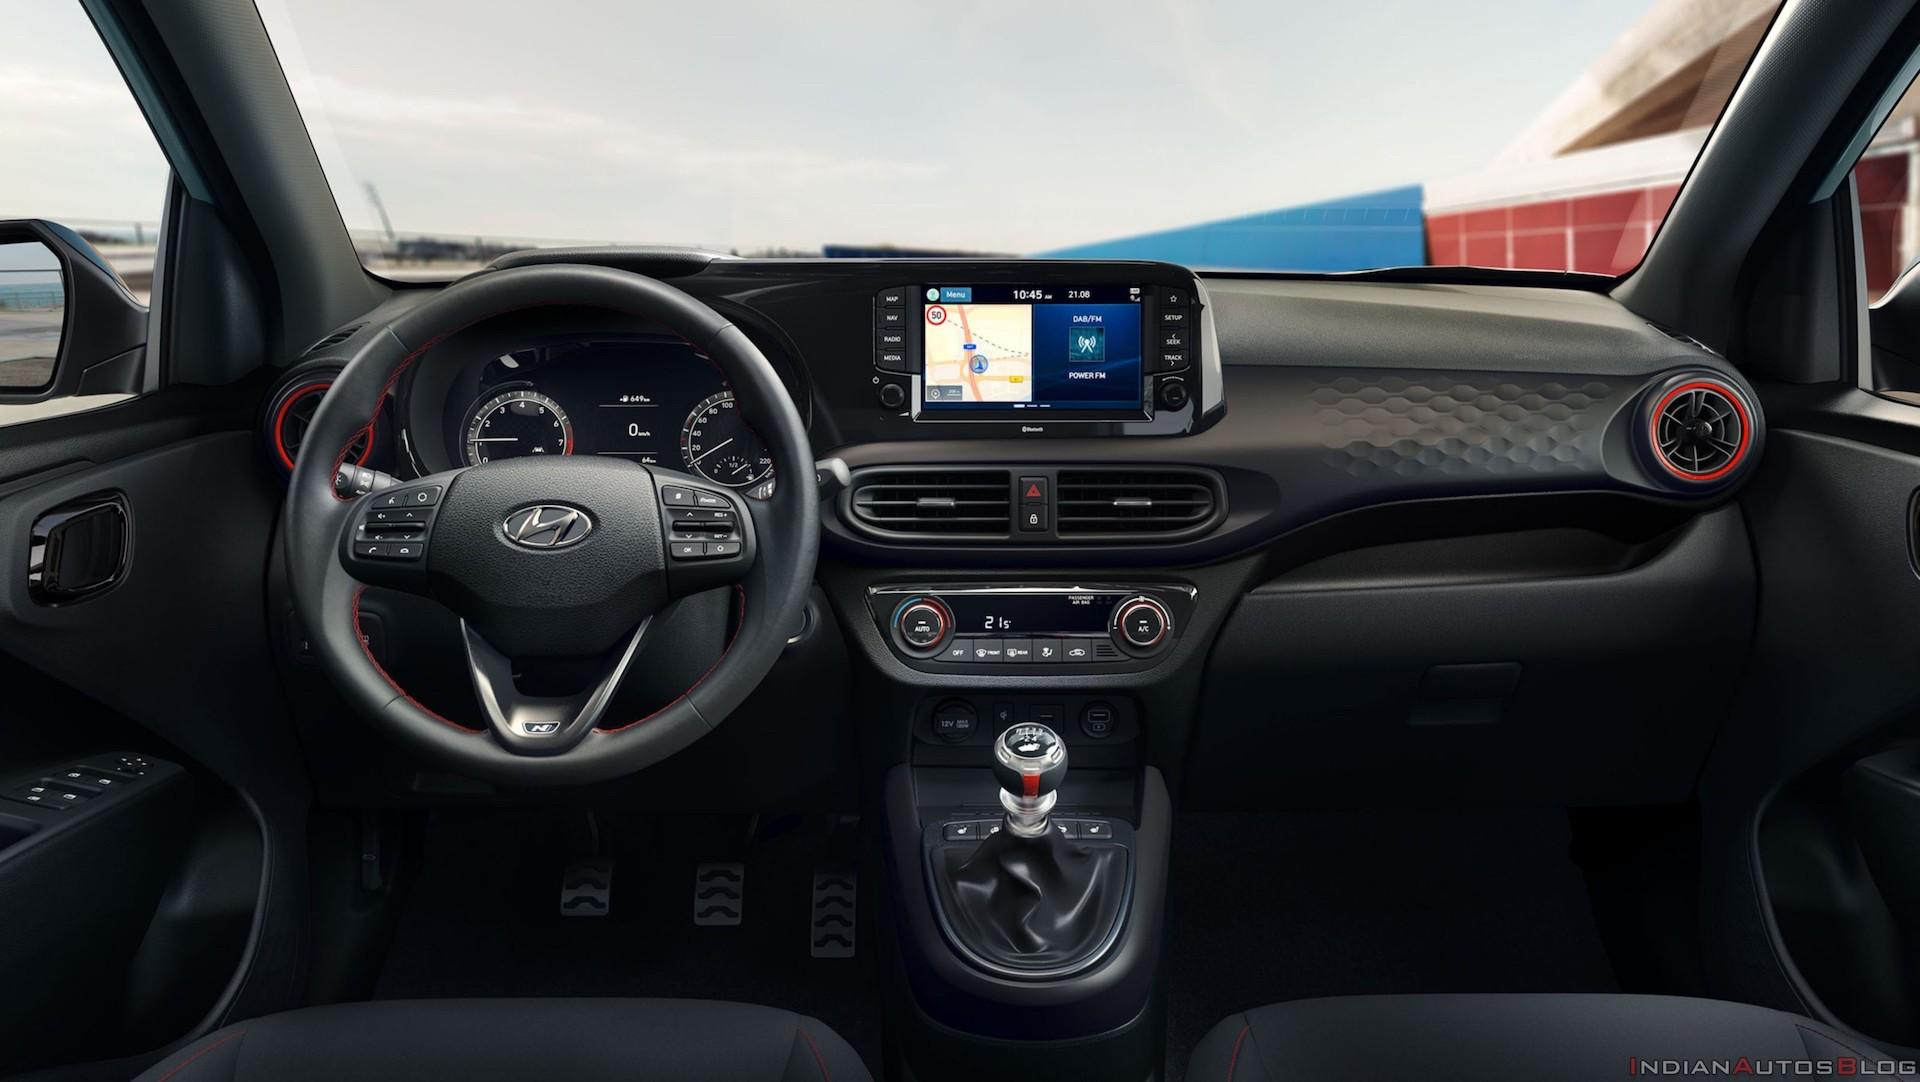 hyundai-i10-n-line-interior-dashboard-3500.jpg